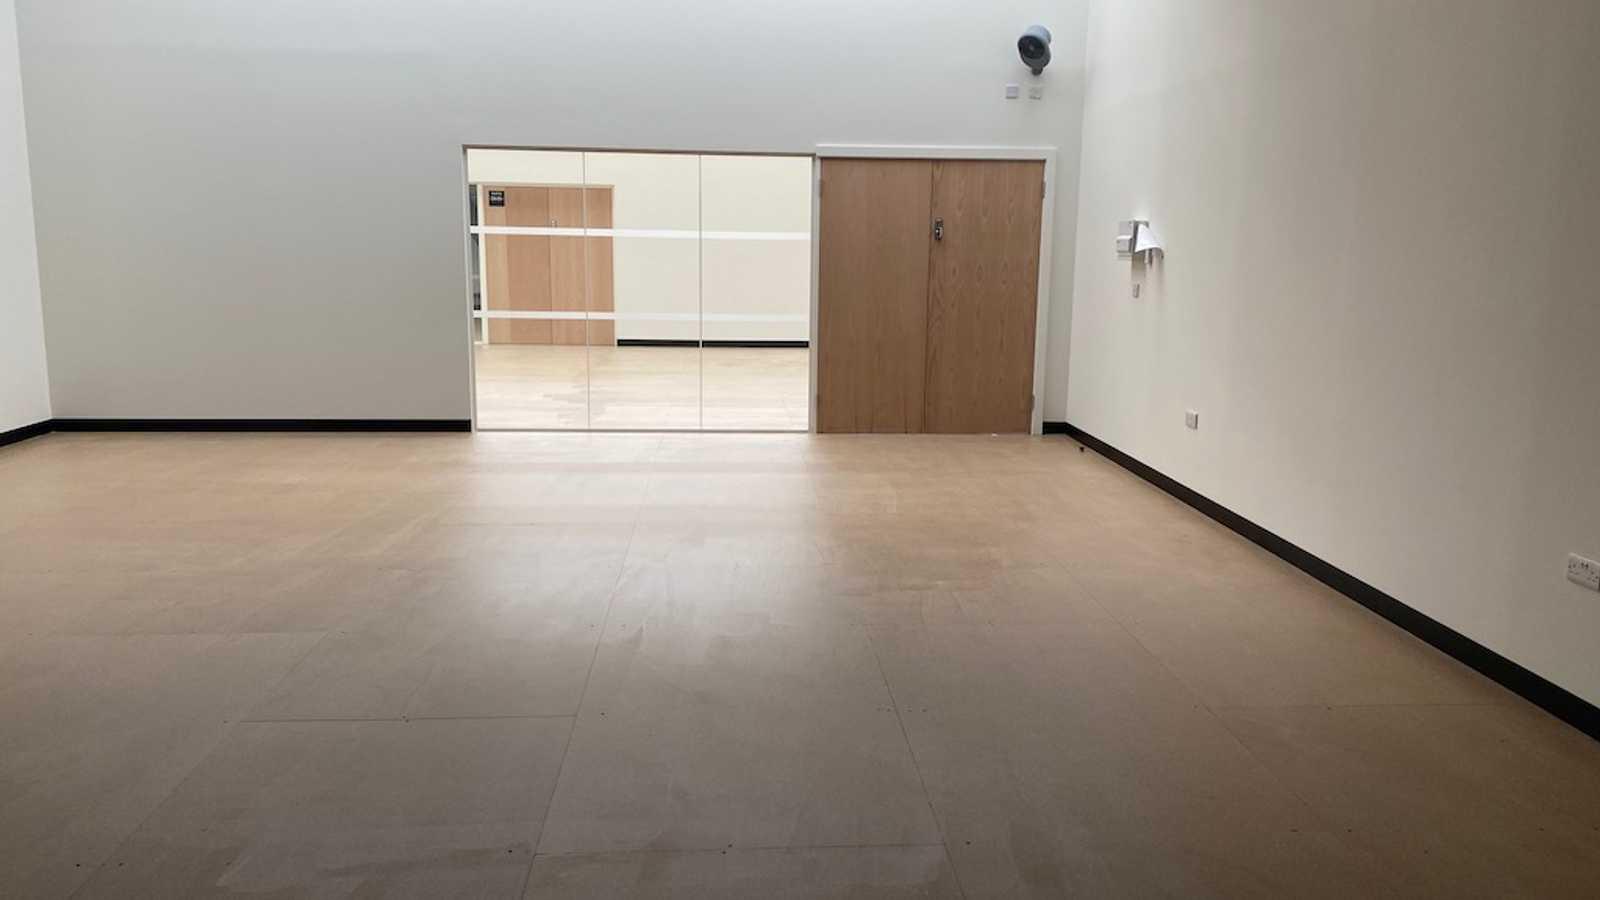 Creative Space - Studio 205/206 - Oxgate House - Brent Cross